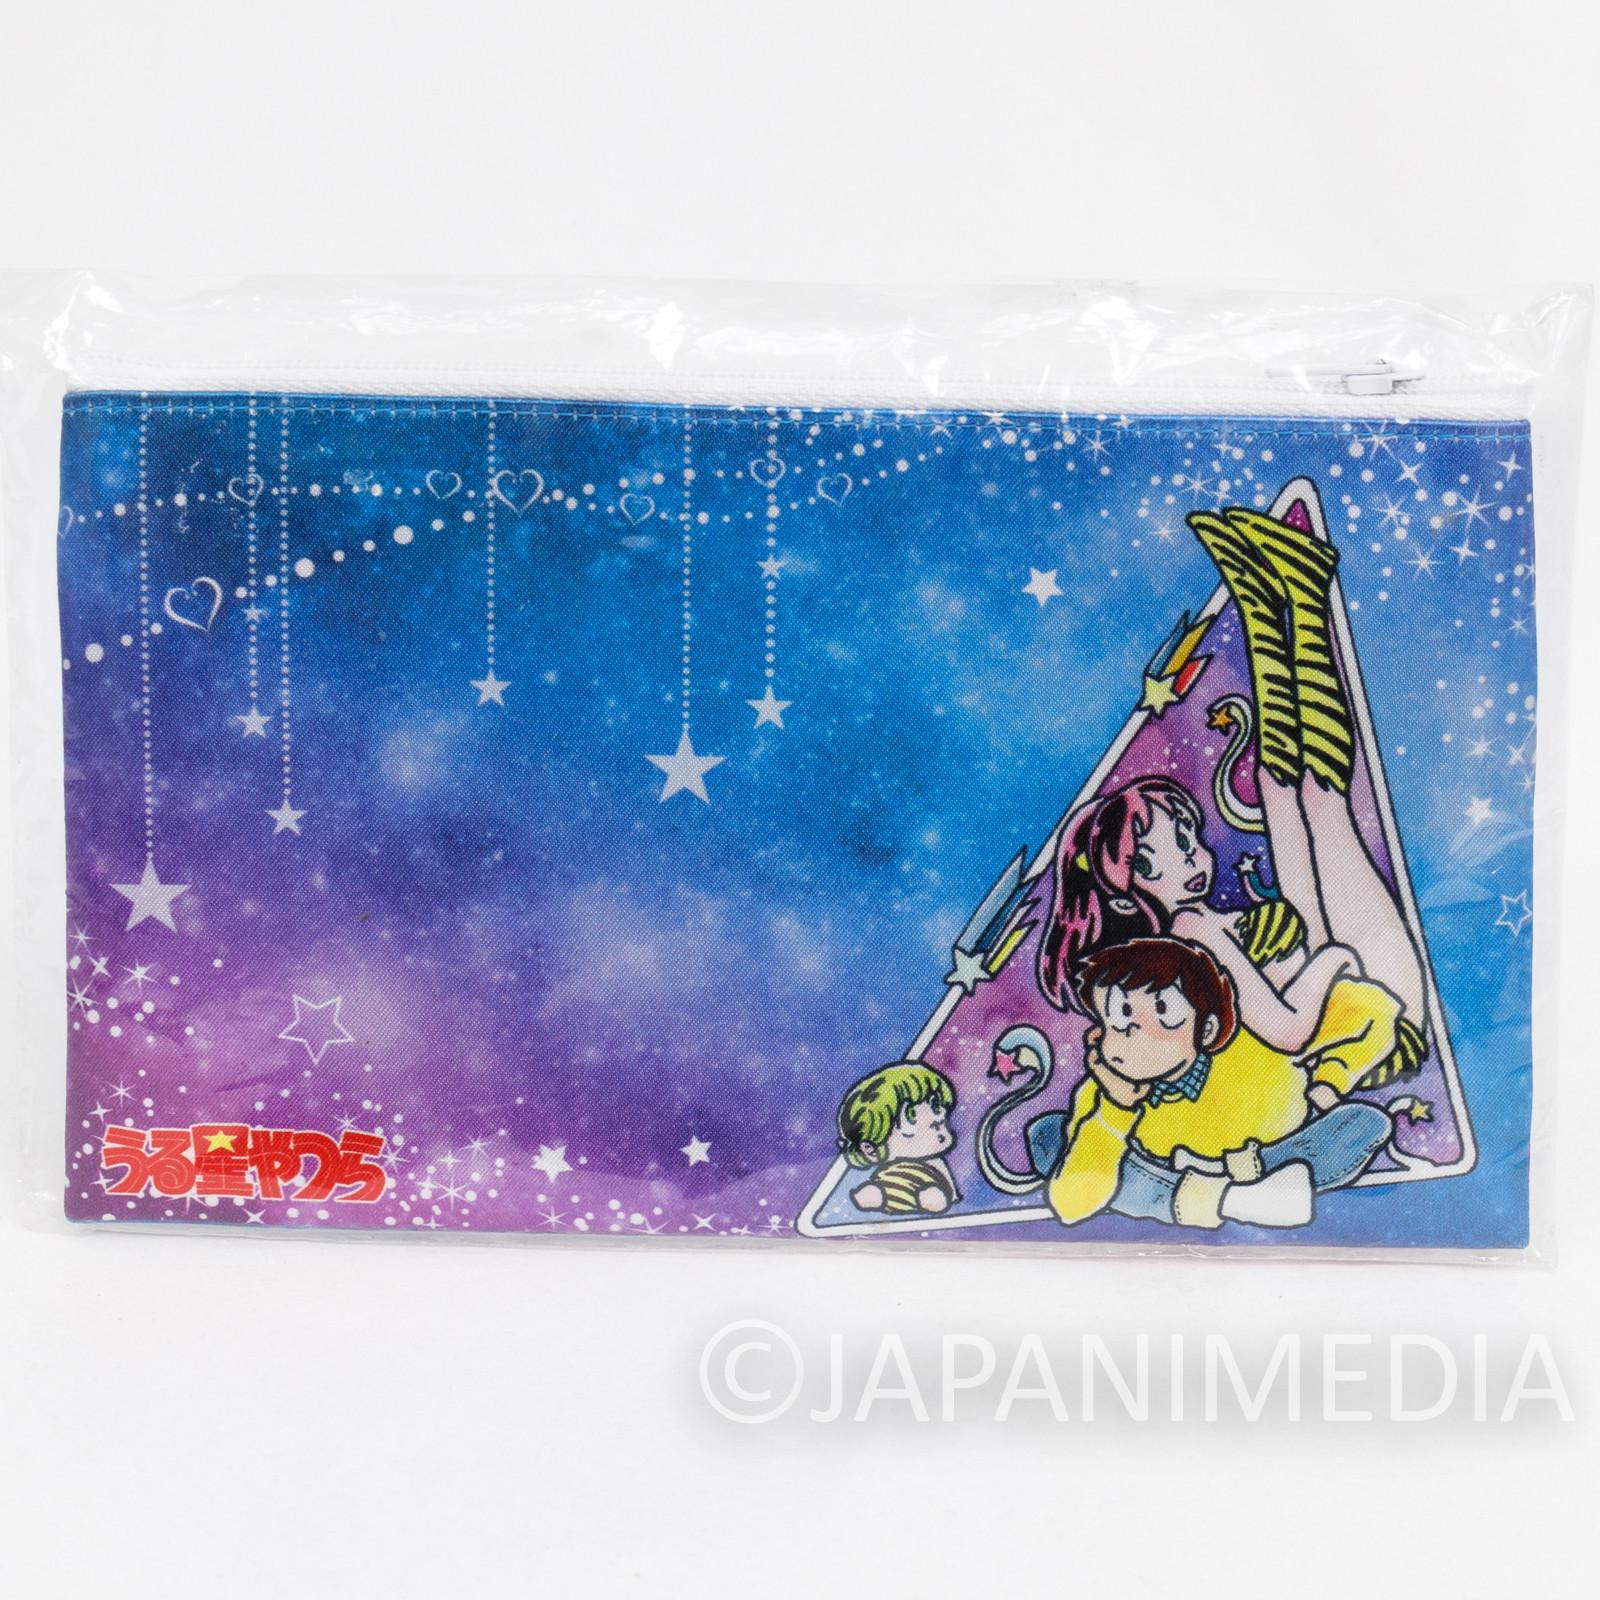 Urusei Yatsura Lum & Ataru Moroboshi Soft Pen Case JAPAN ANIME MANGA